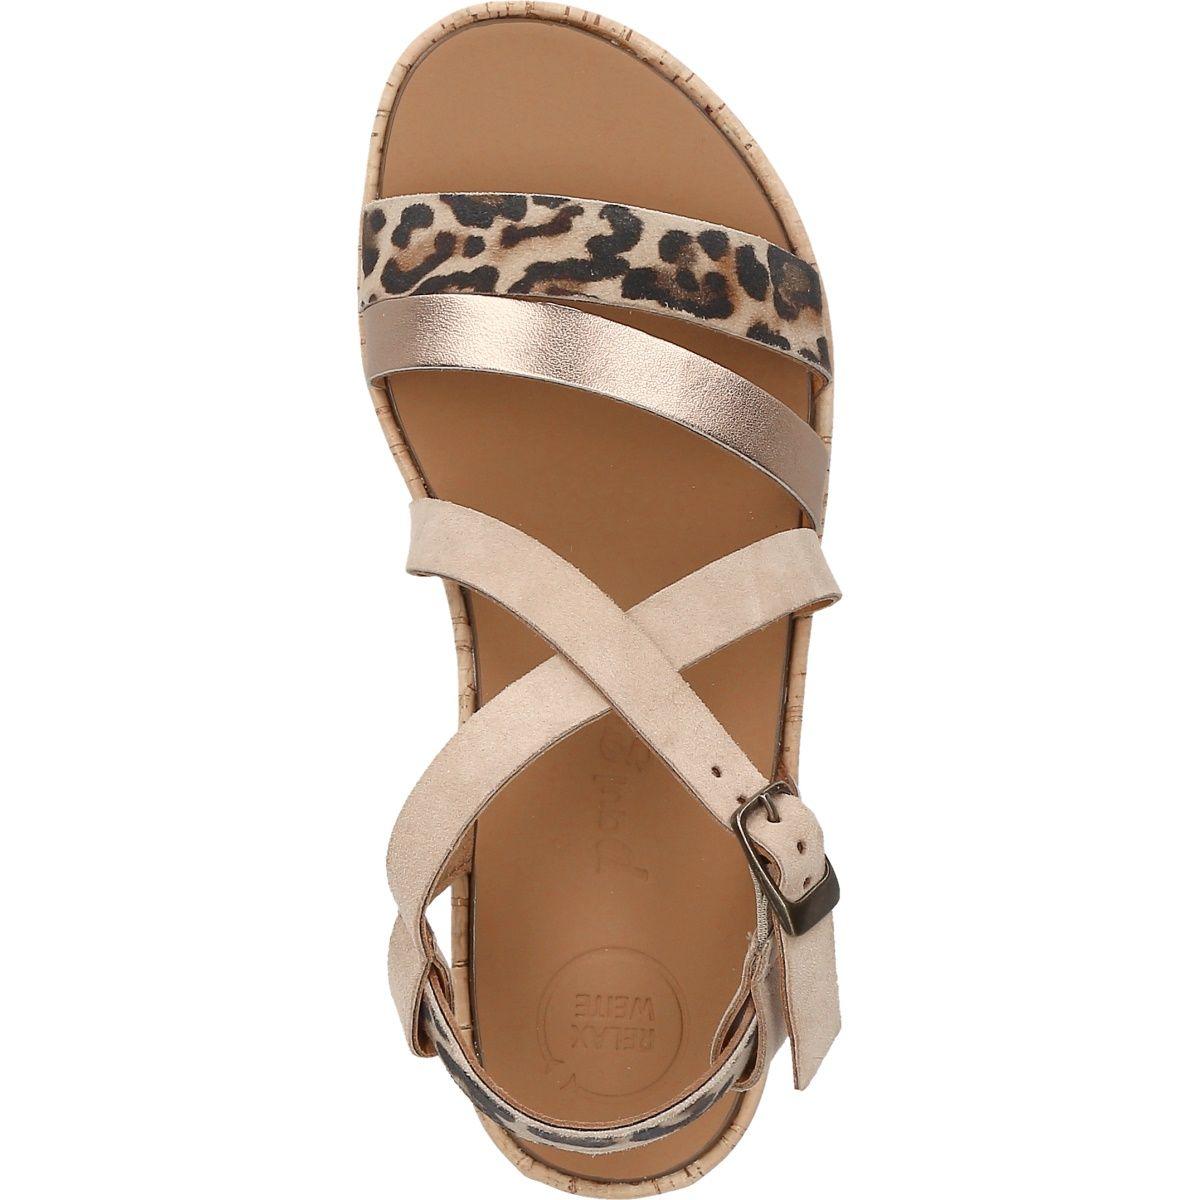 Green Sandaletten Paul In Kaufen Vyby7fg6 Beige Im 7498 004 Shop Online uTlc5JK3F1